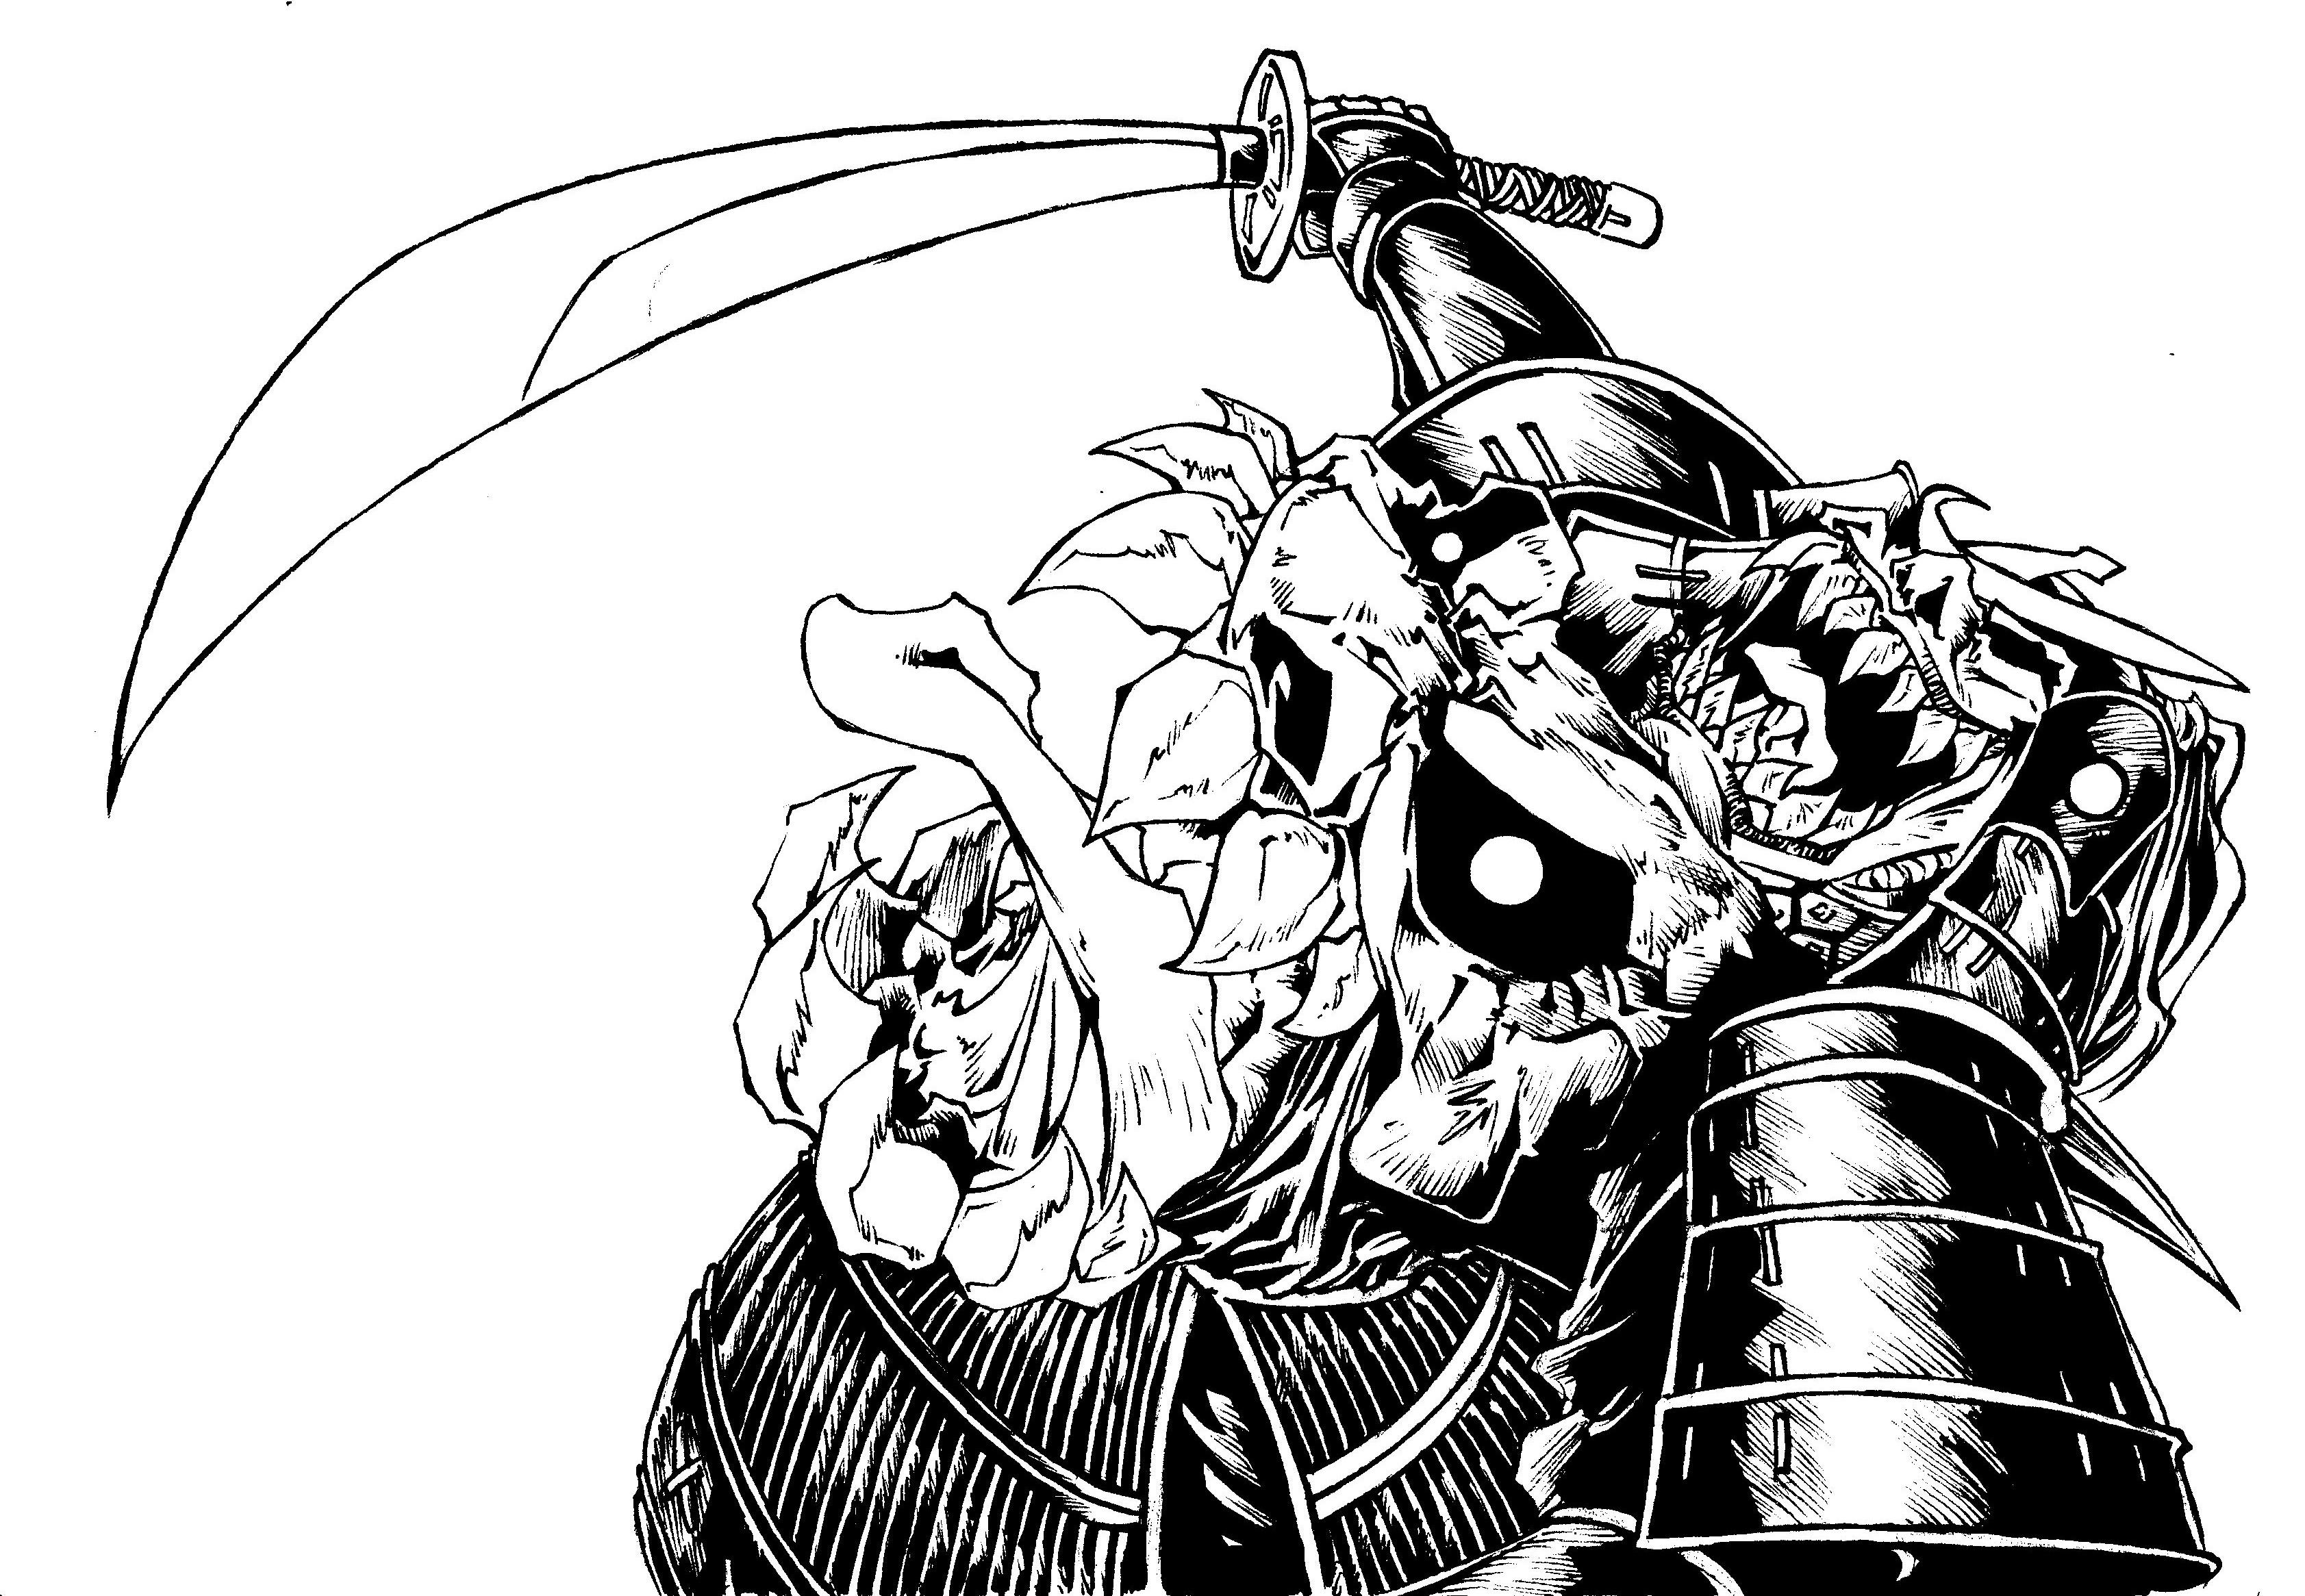 demon samurai bishamon revised by biggcaz on deviantart